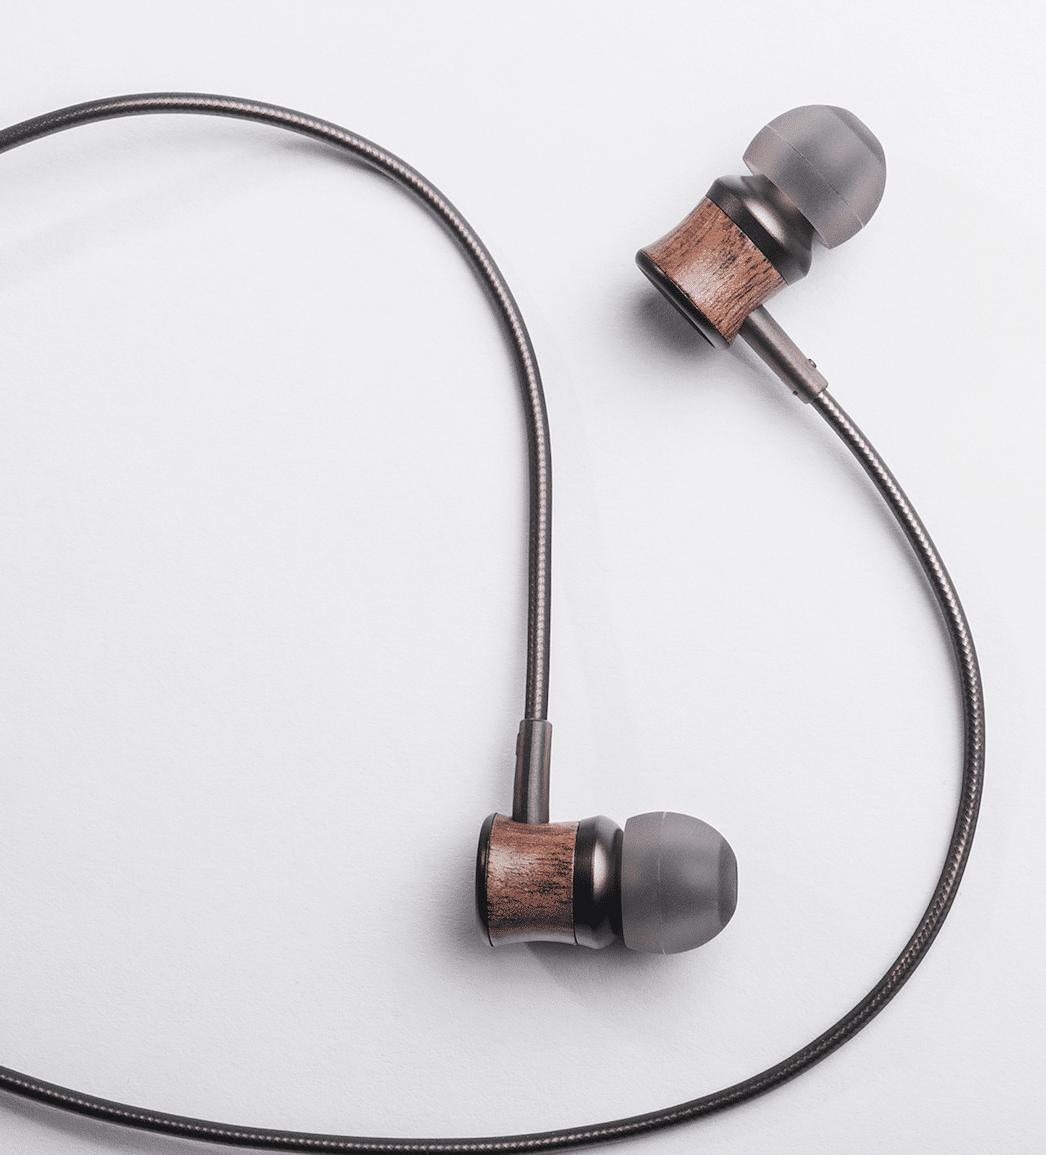 Meze 12 Classics: Stylish 'Phones on a budget